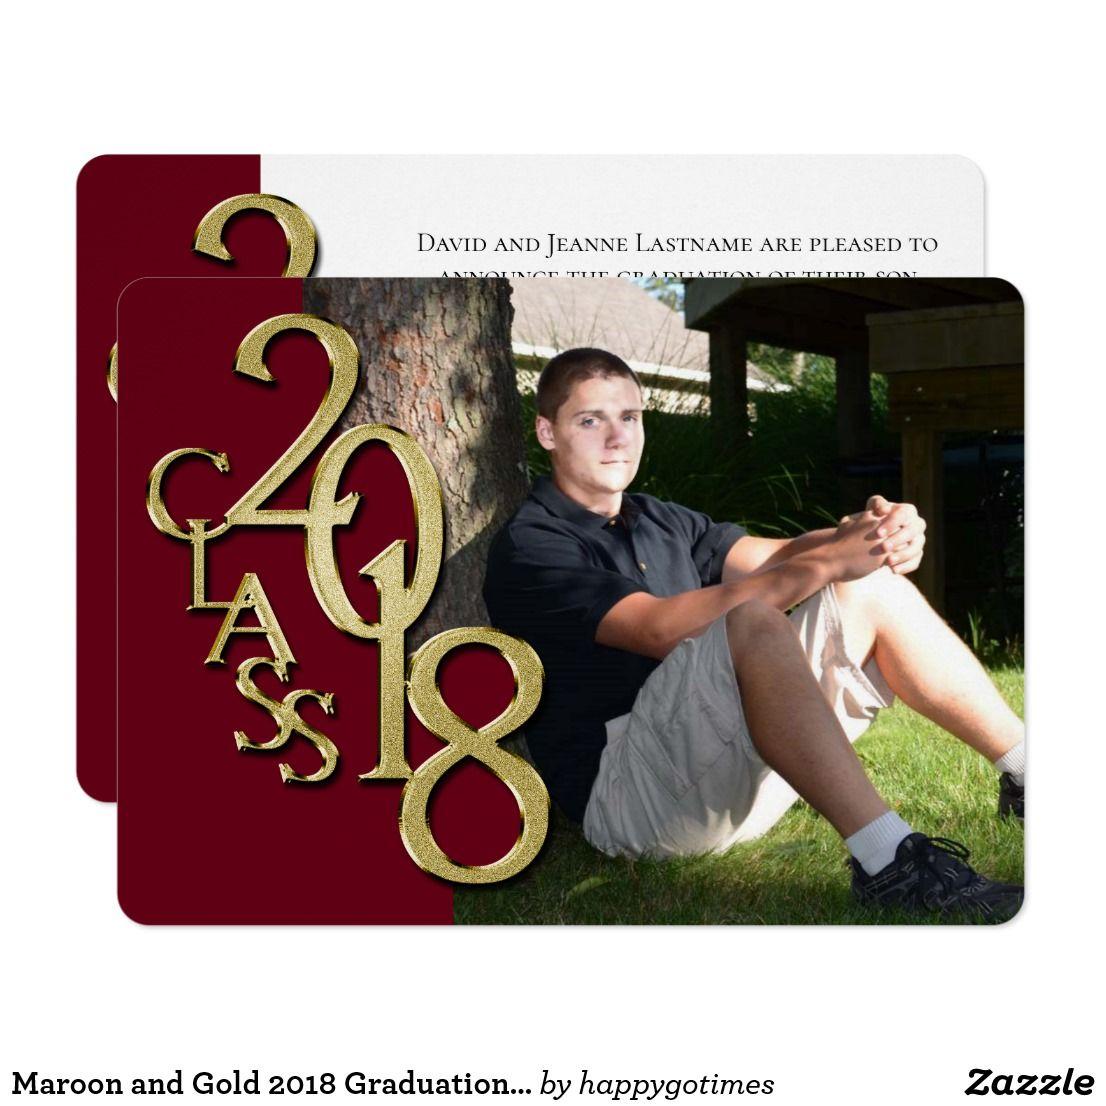 Maroon and Gold 2018 Graduation Invitation